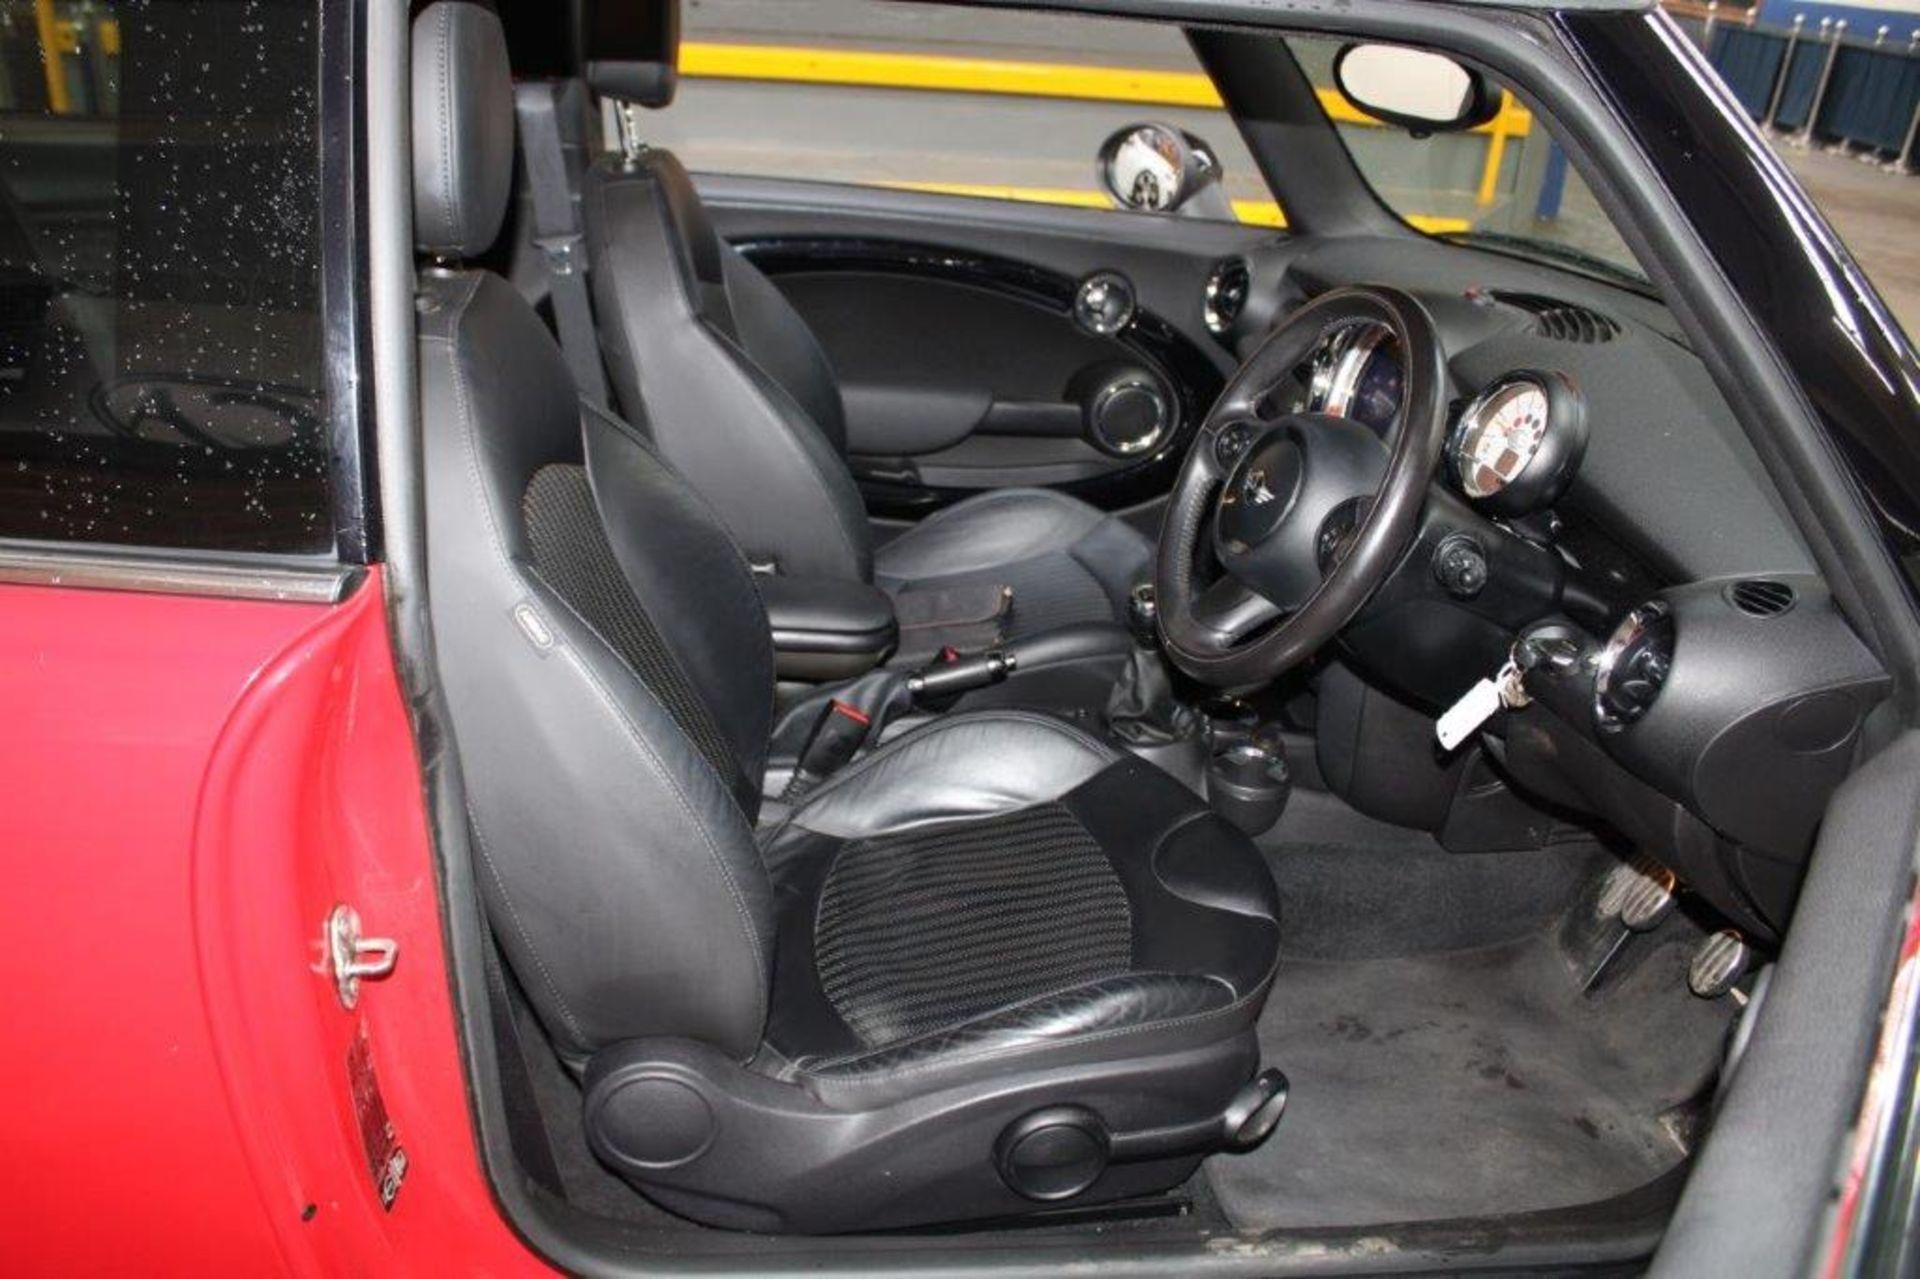 61 11 Mini Cooper S - Image 20 of 26